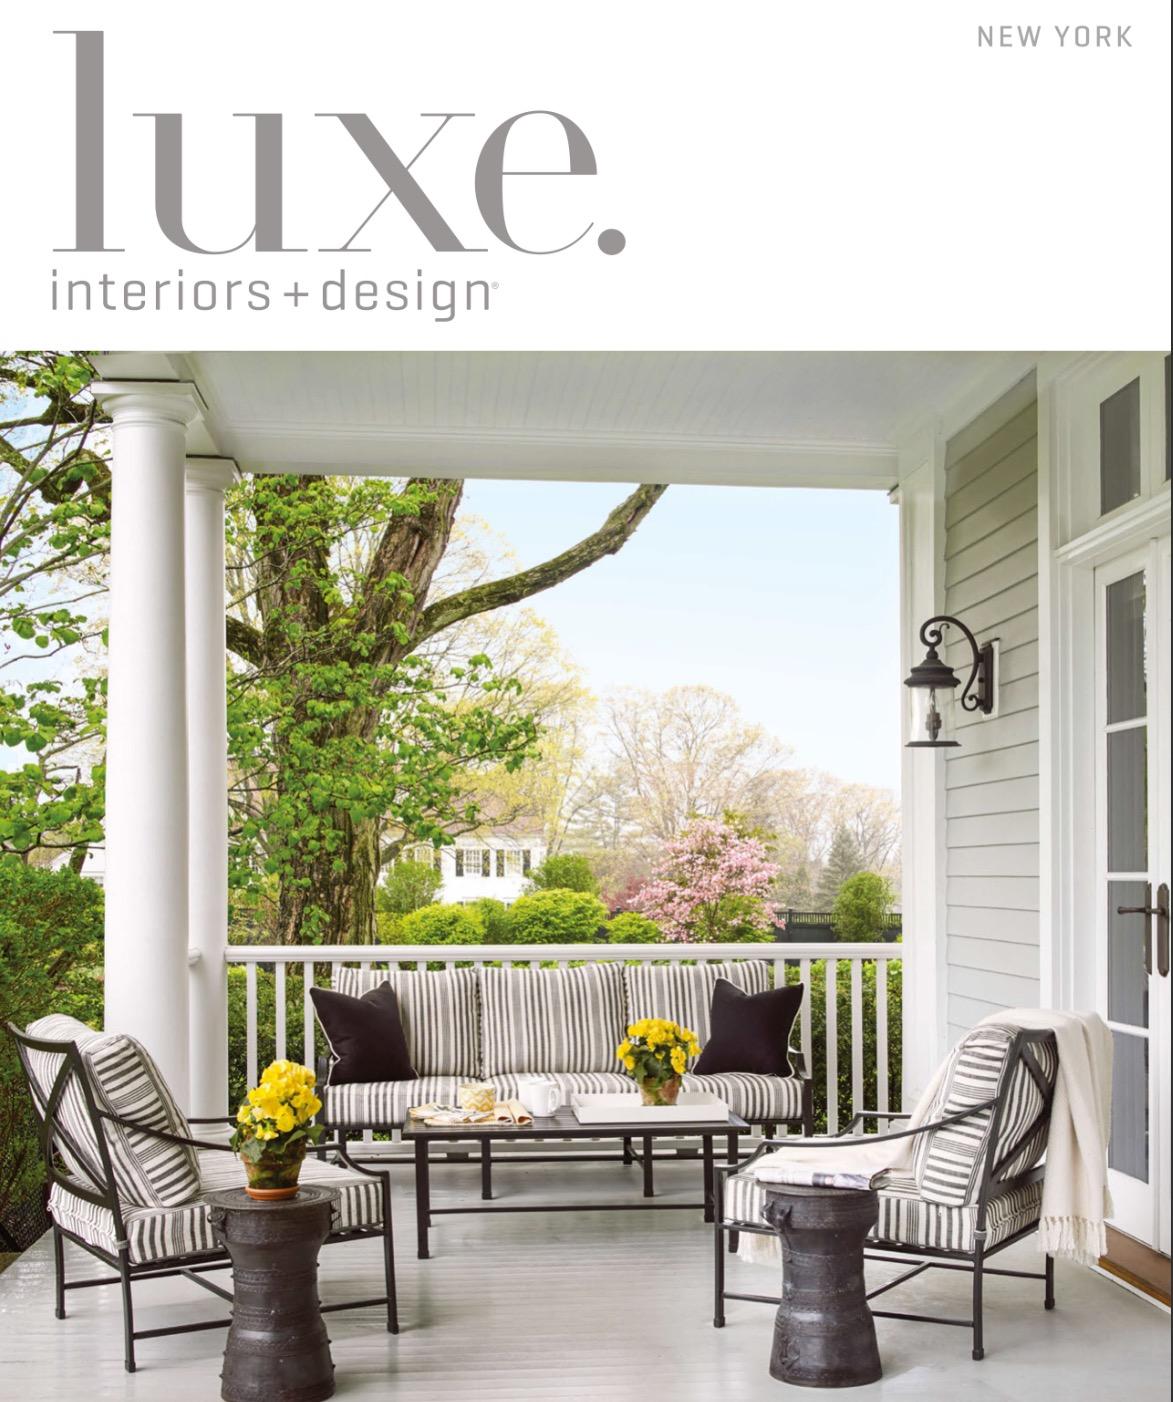 Luxe interiors design stewart schafer for Luxe interieur design